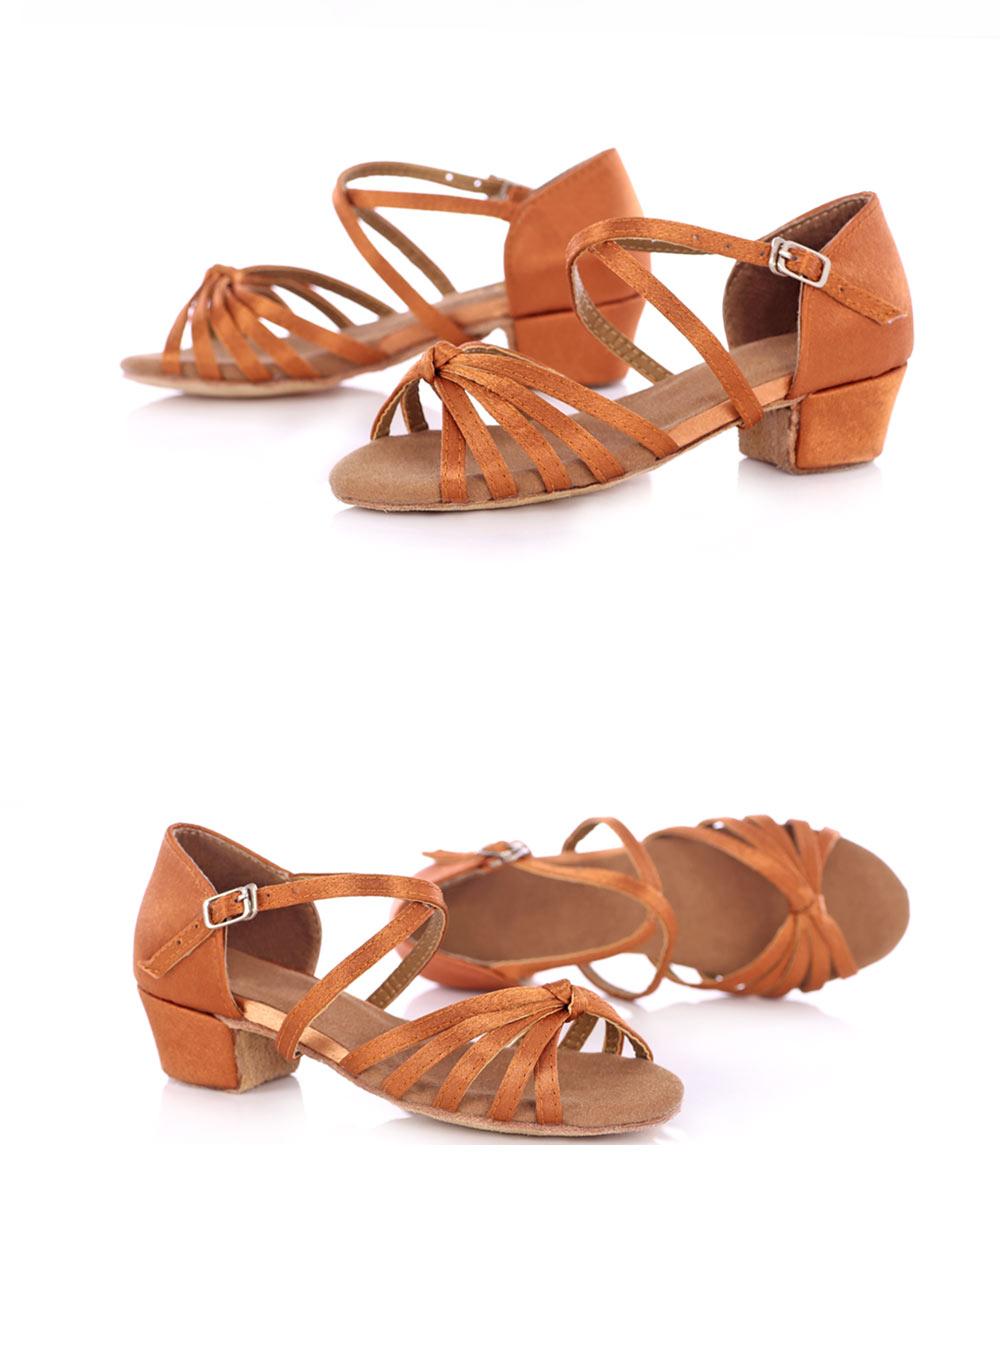 New Arrival Ballroom Tango Latin Dance Shoes High Quality Latin Woman Dancing Shoe Wholesale Women'S Heel Shoes Fast Shipping (13)